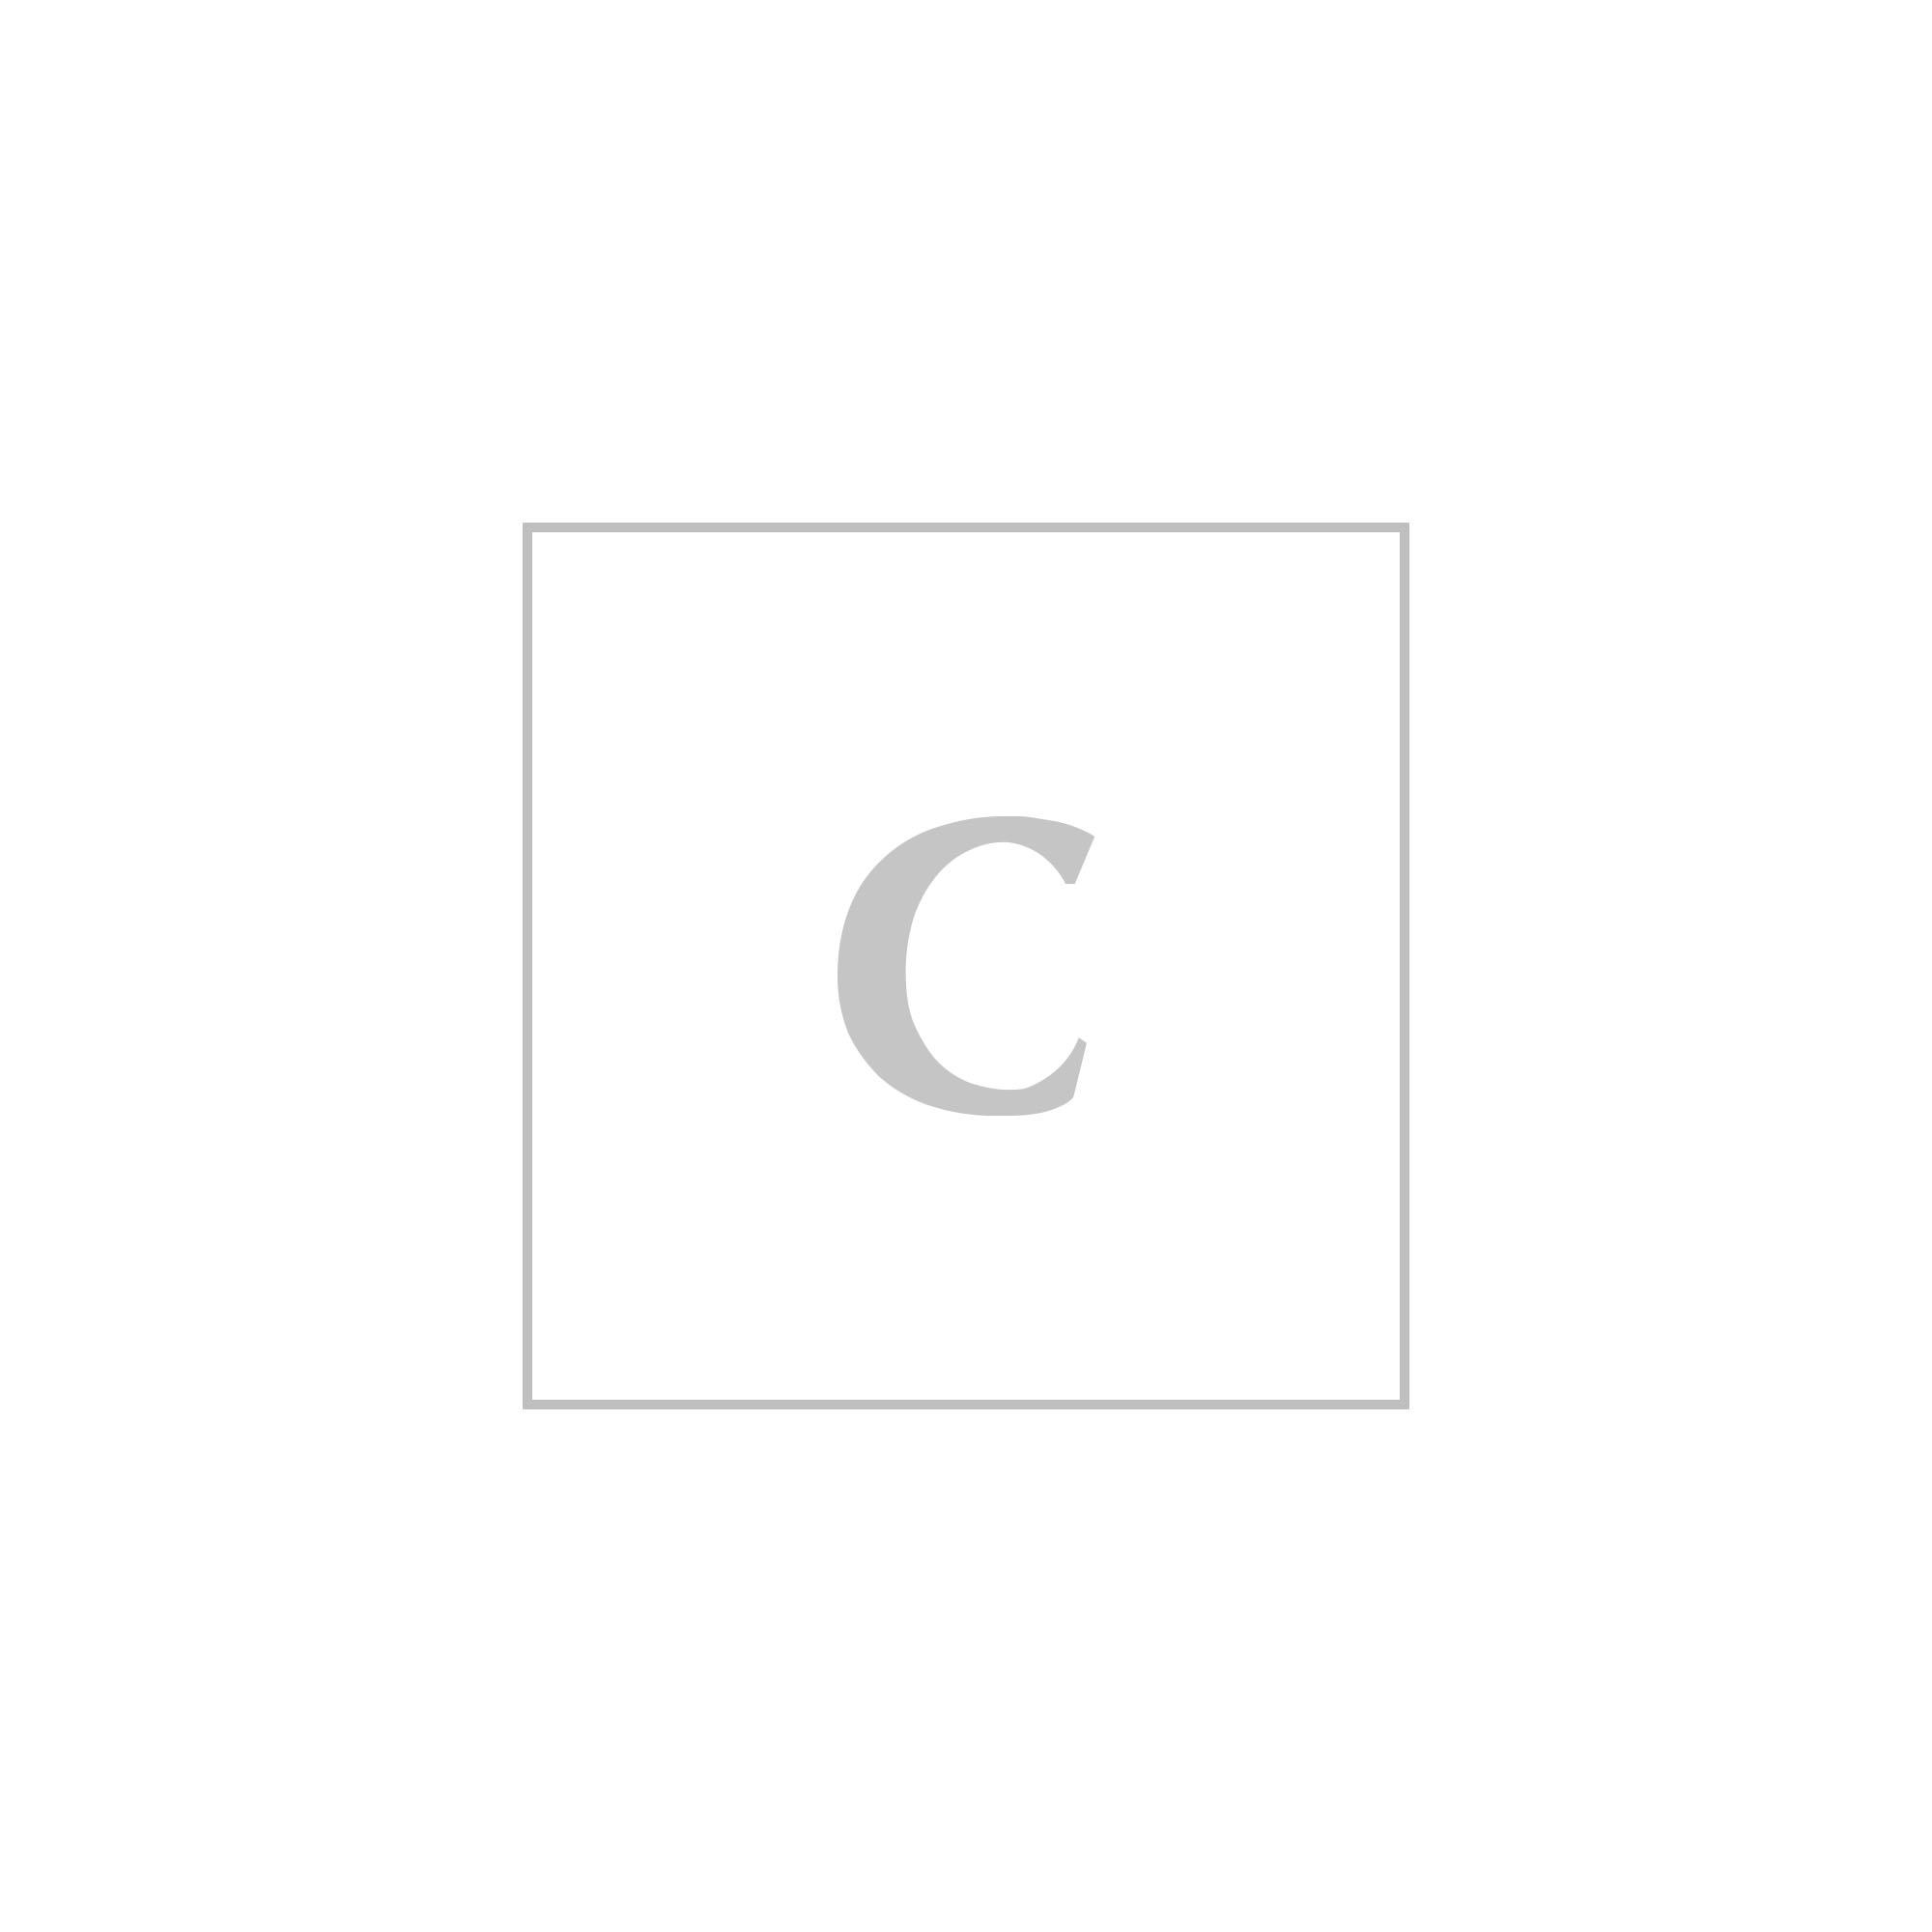 Michael kors abito sl logo shirred drs